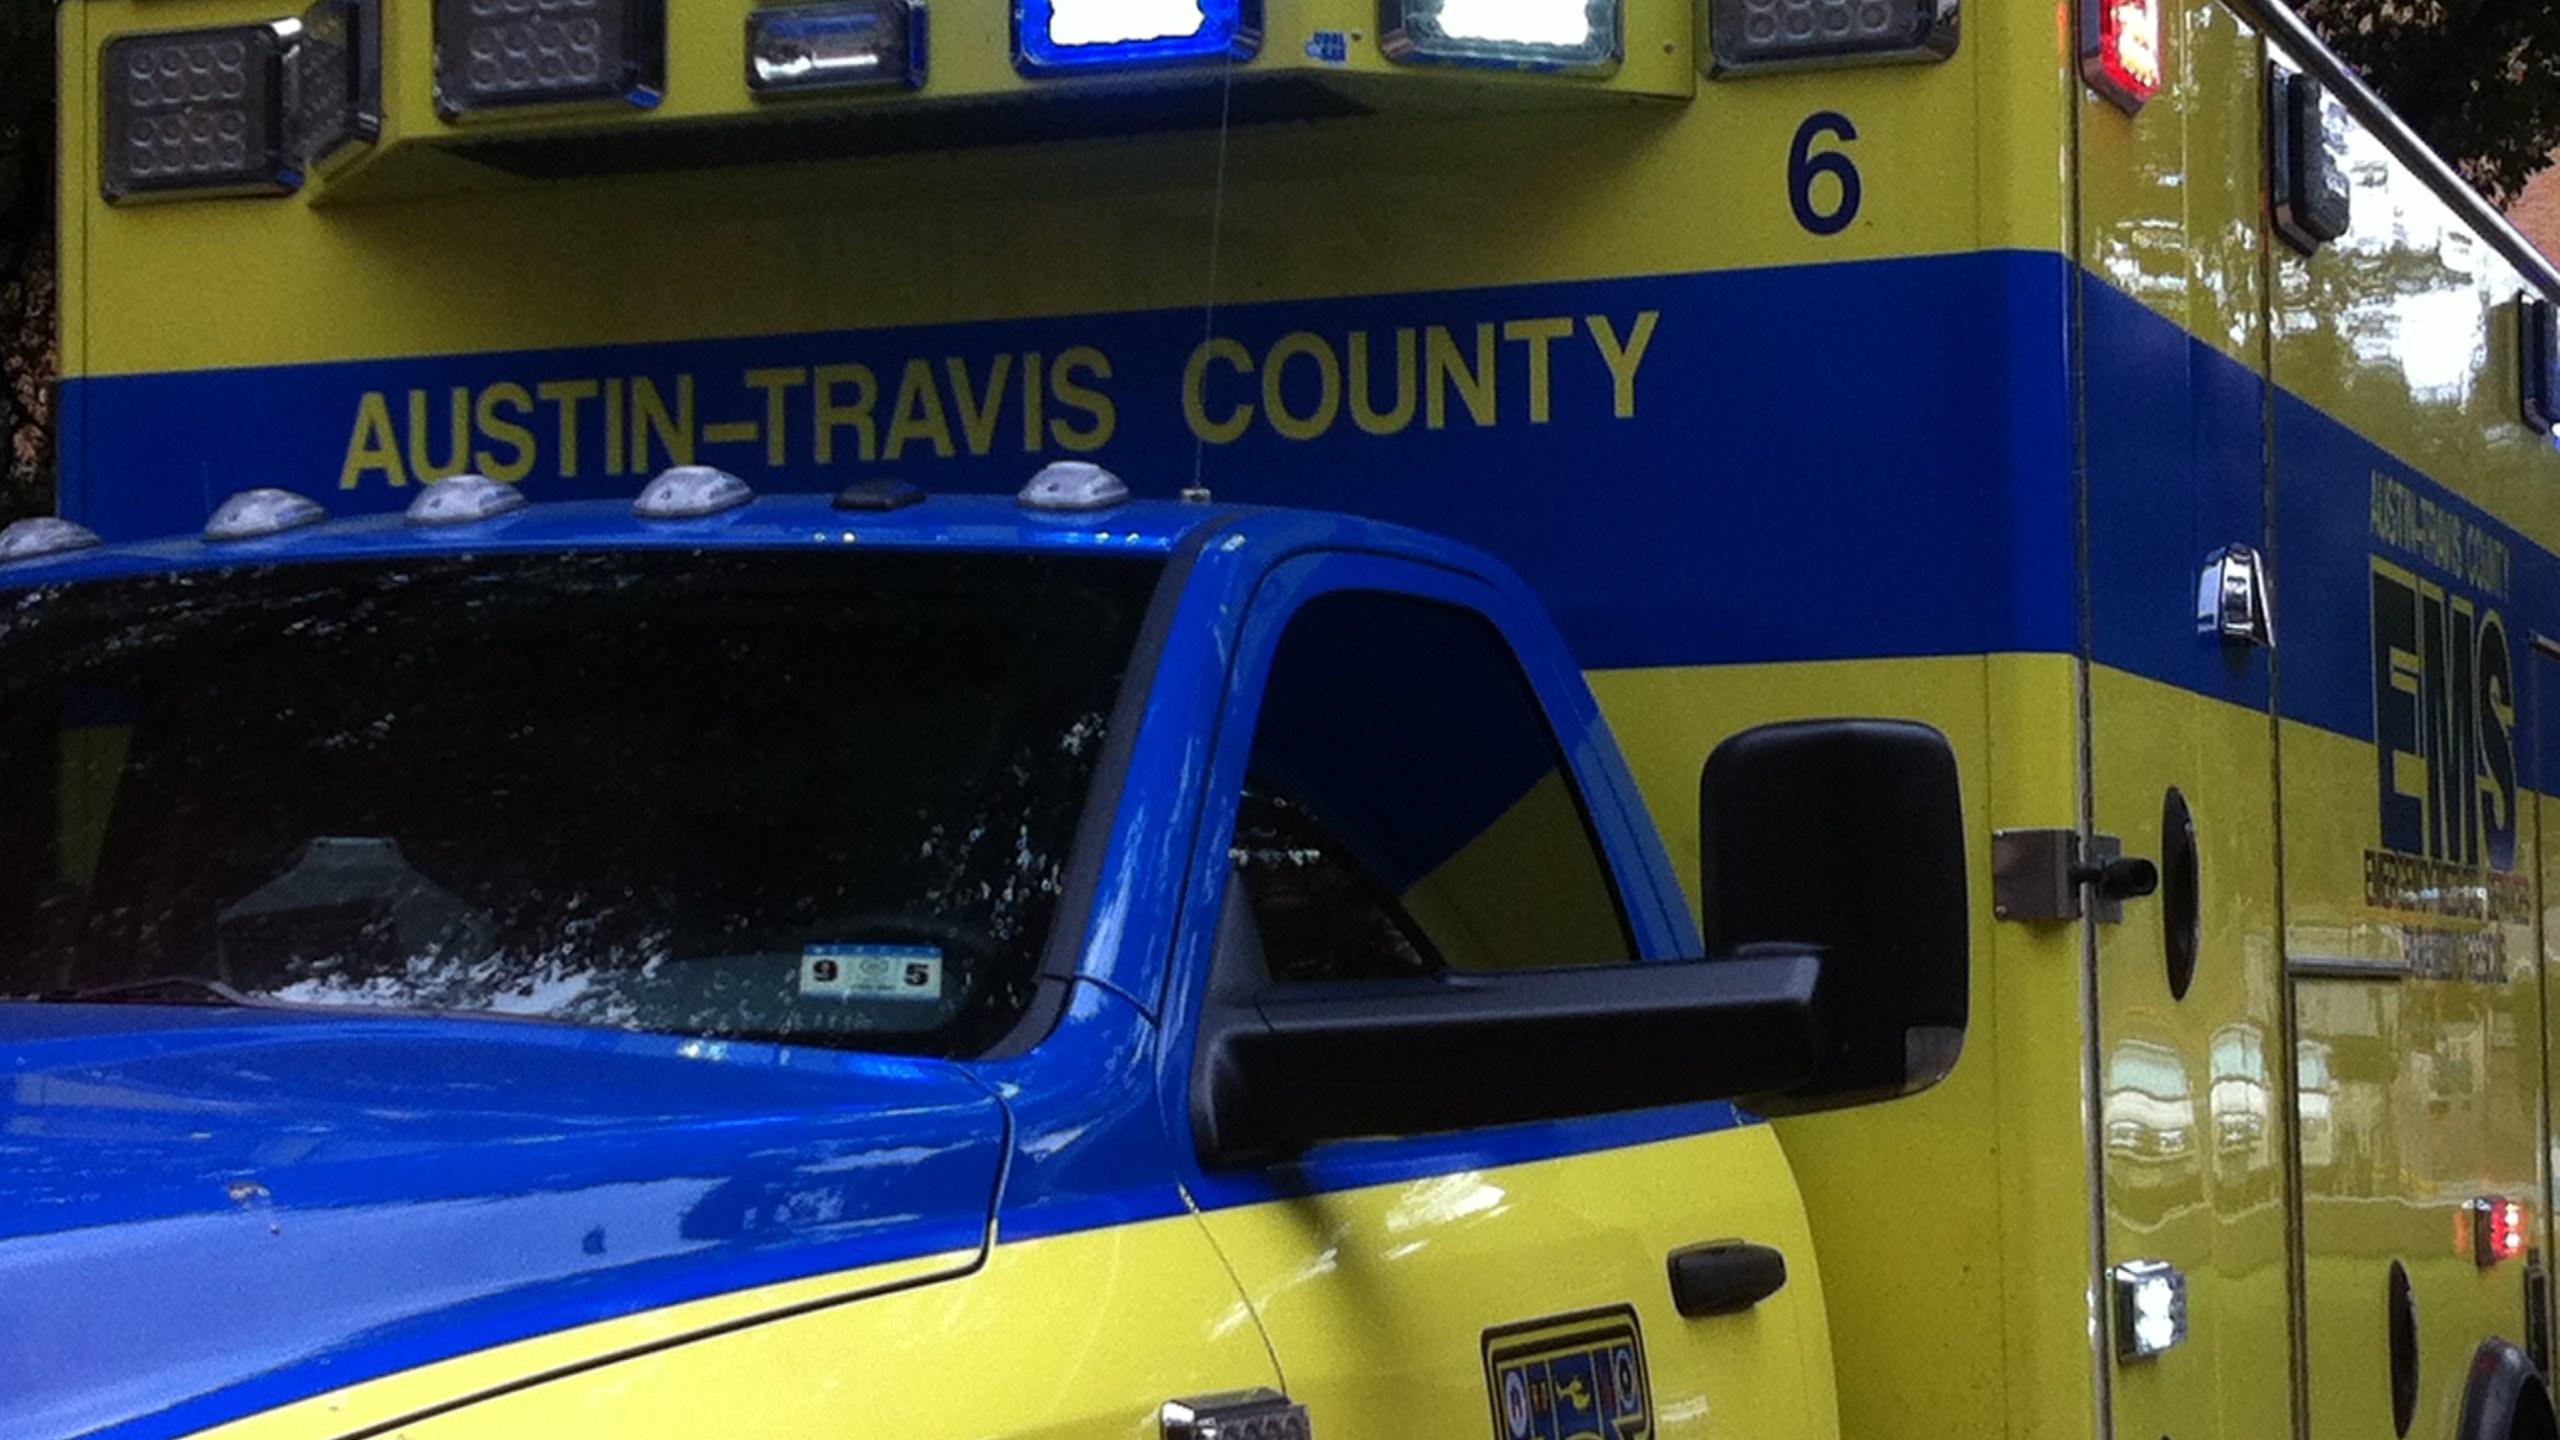 ATCEMS Austin-Travis County EMS_106881